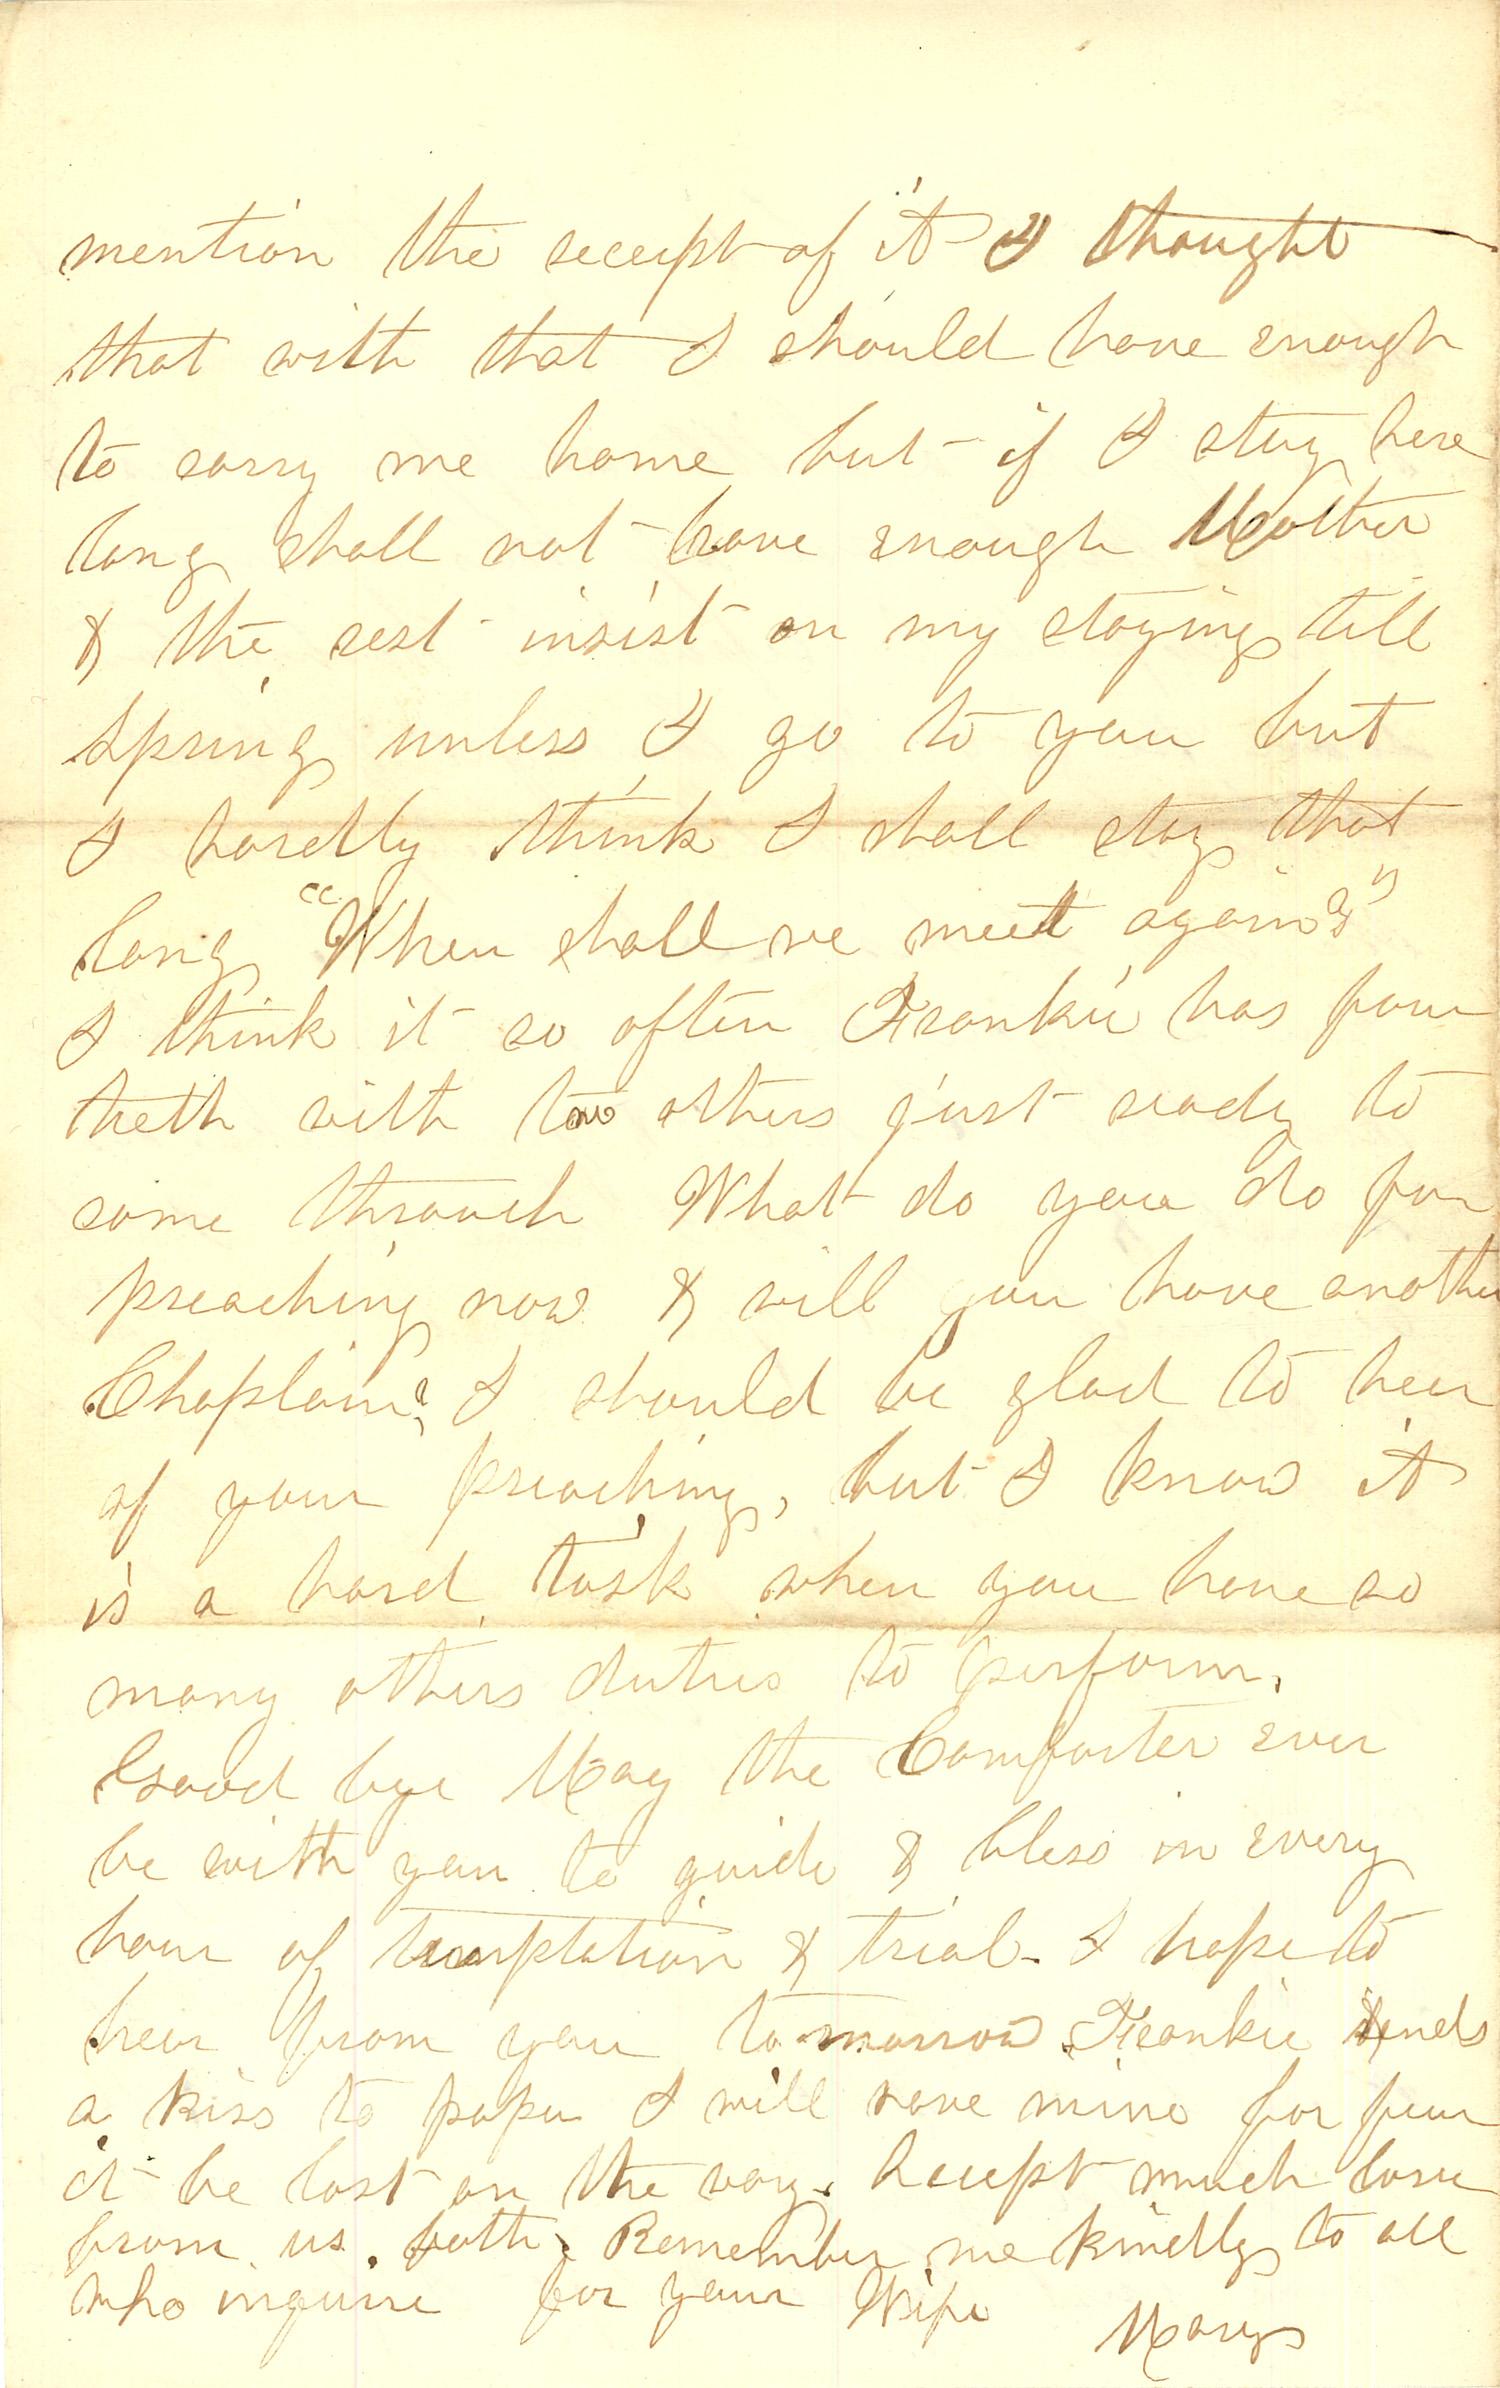 Joseph Culver Letter, September 27, 1863, Page 4